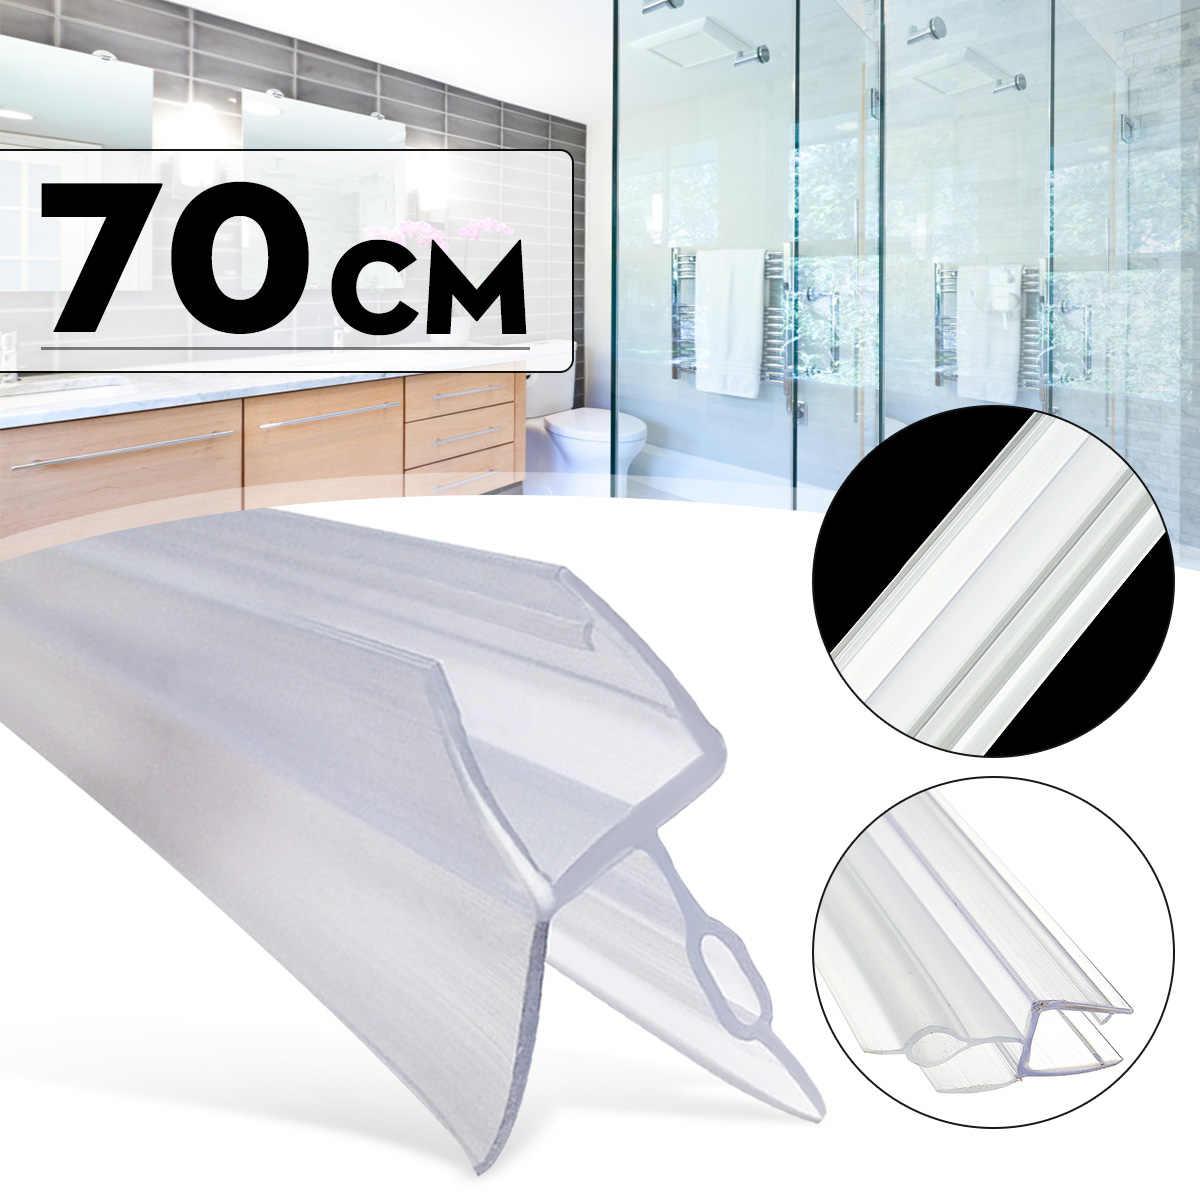 4 6mm Shower Screen Water Seal Strip Bar Curved Flat Glass